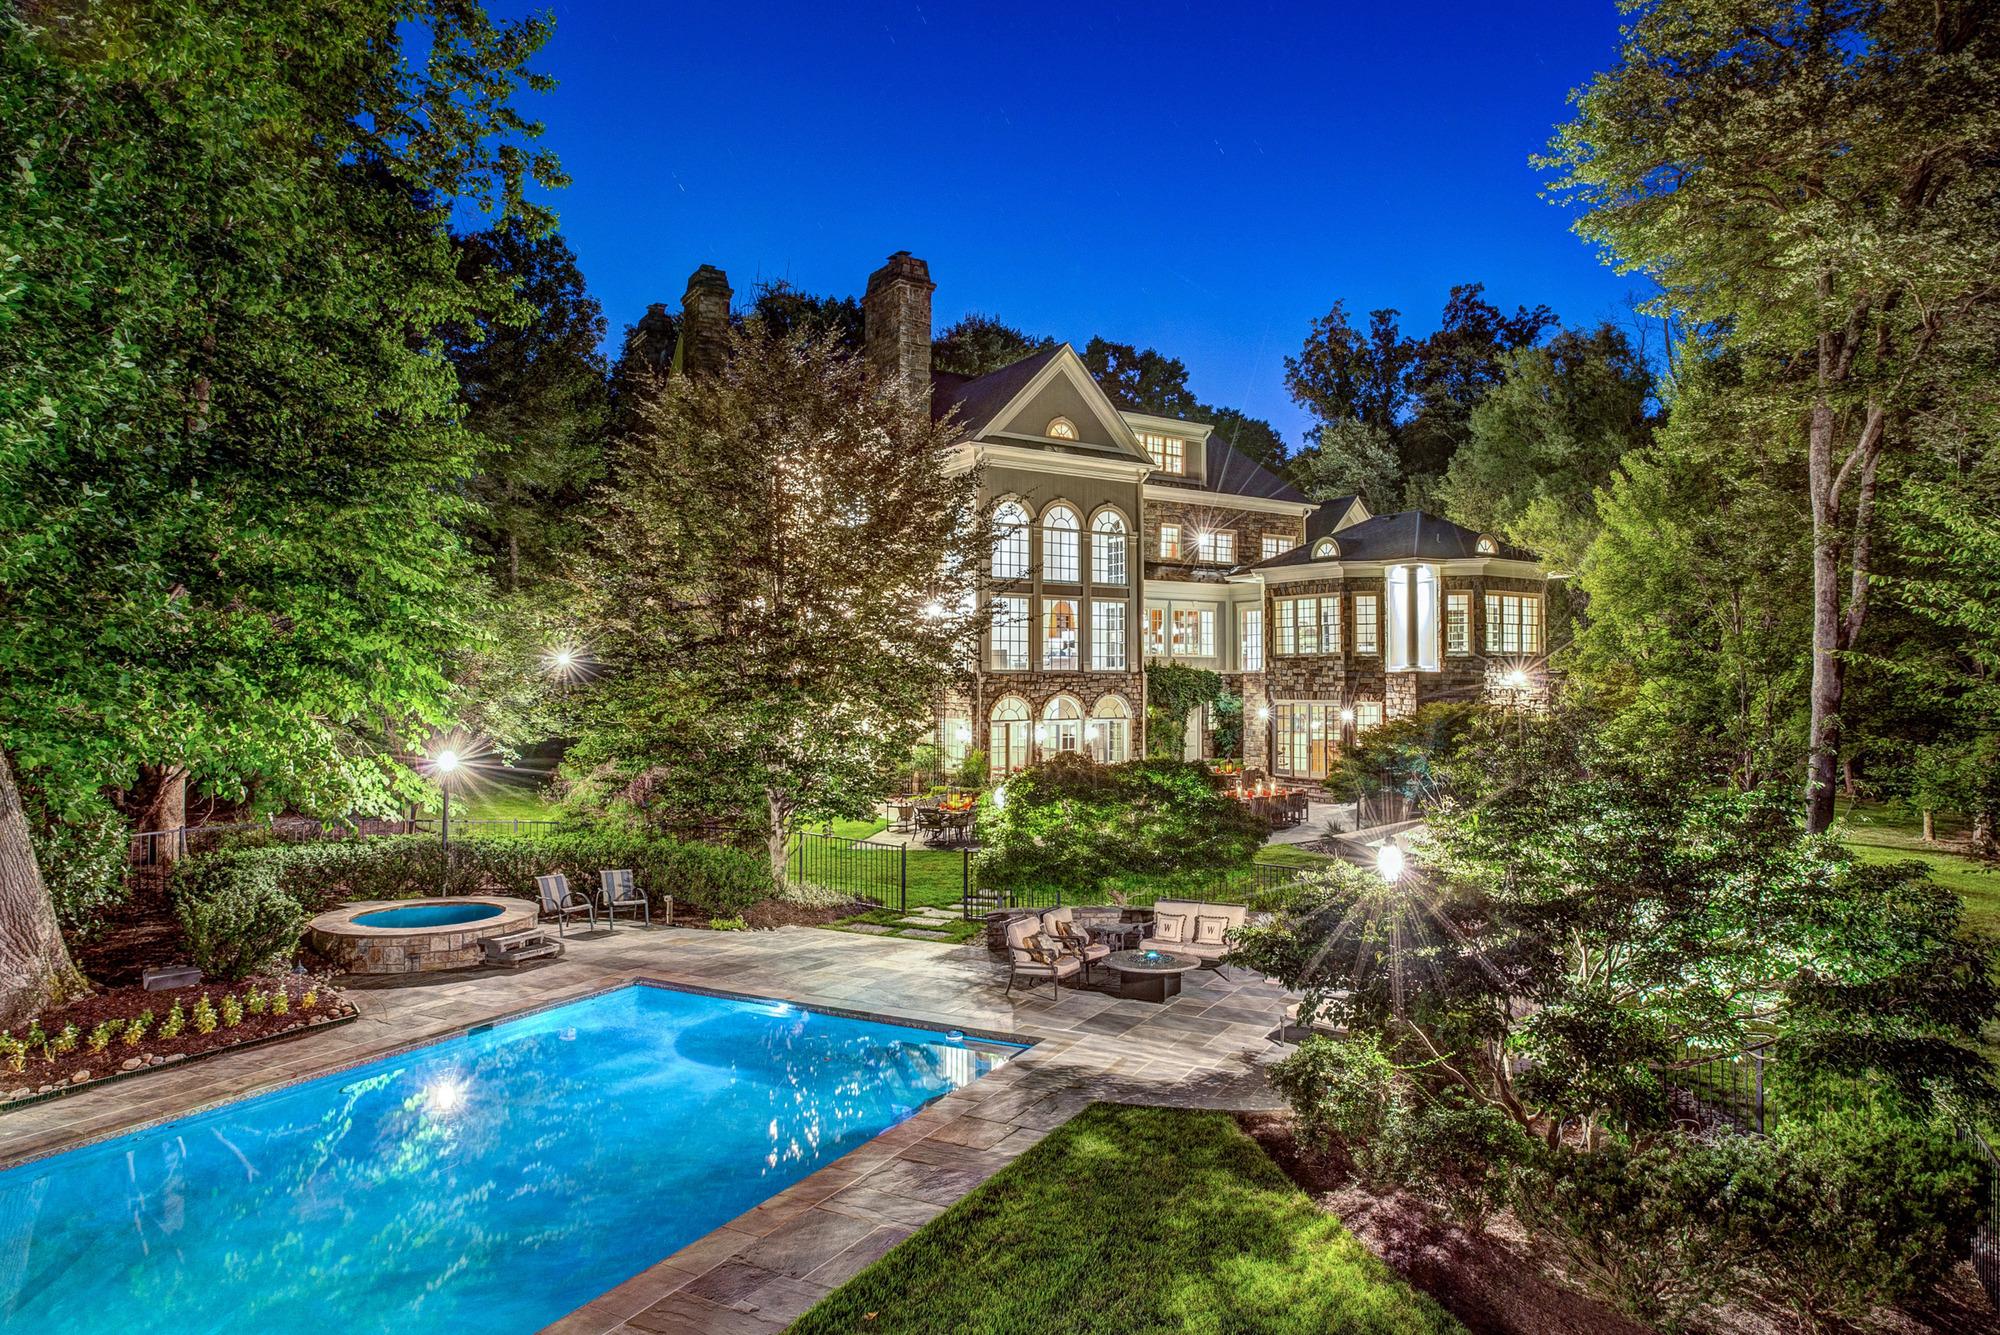 Real Estate Floor Plan Homevisit Virtual Tour 558 Innsbruck Ave Great Falls Va